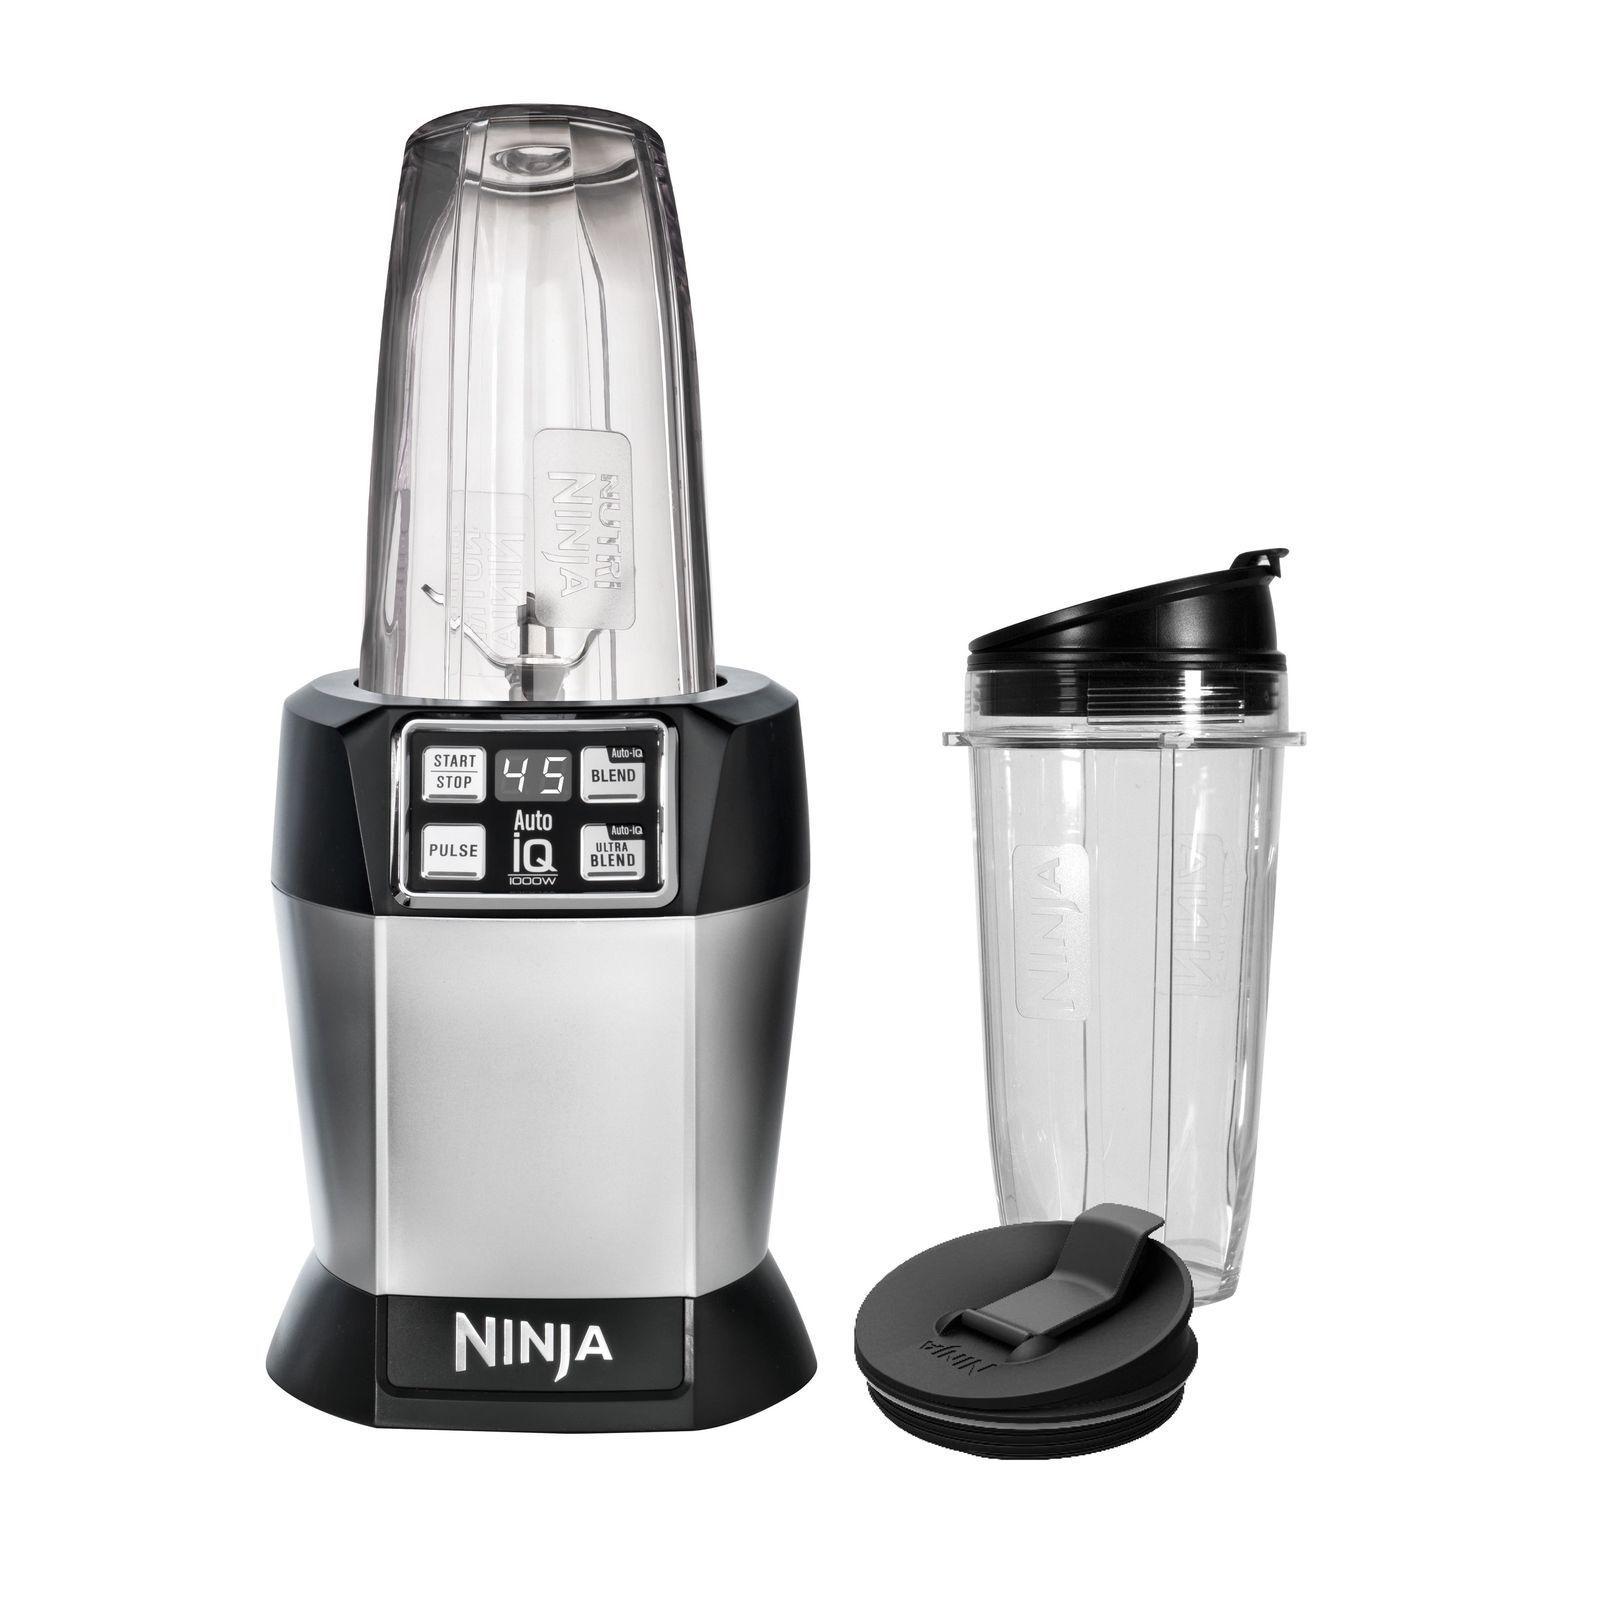 Ninja BL480D Nutri Ninja Auto IQ haute vitesse simple servir Blender rénové